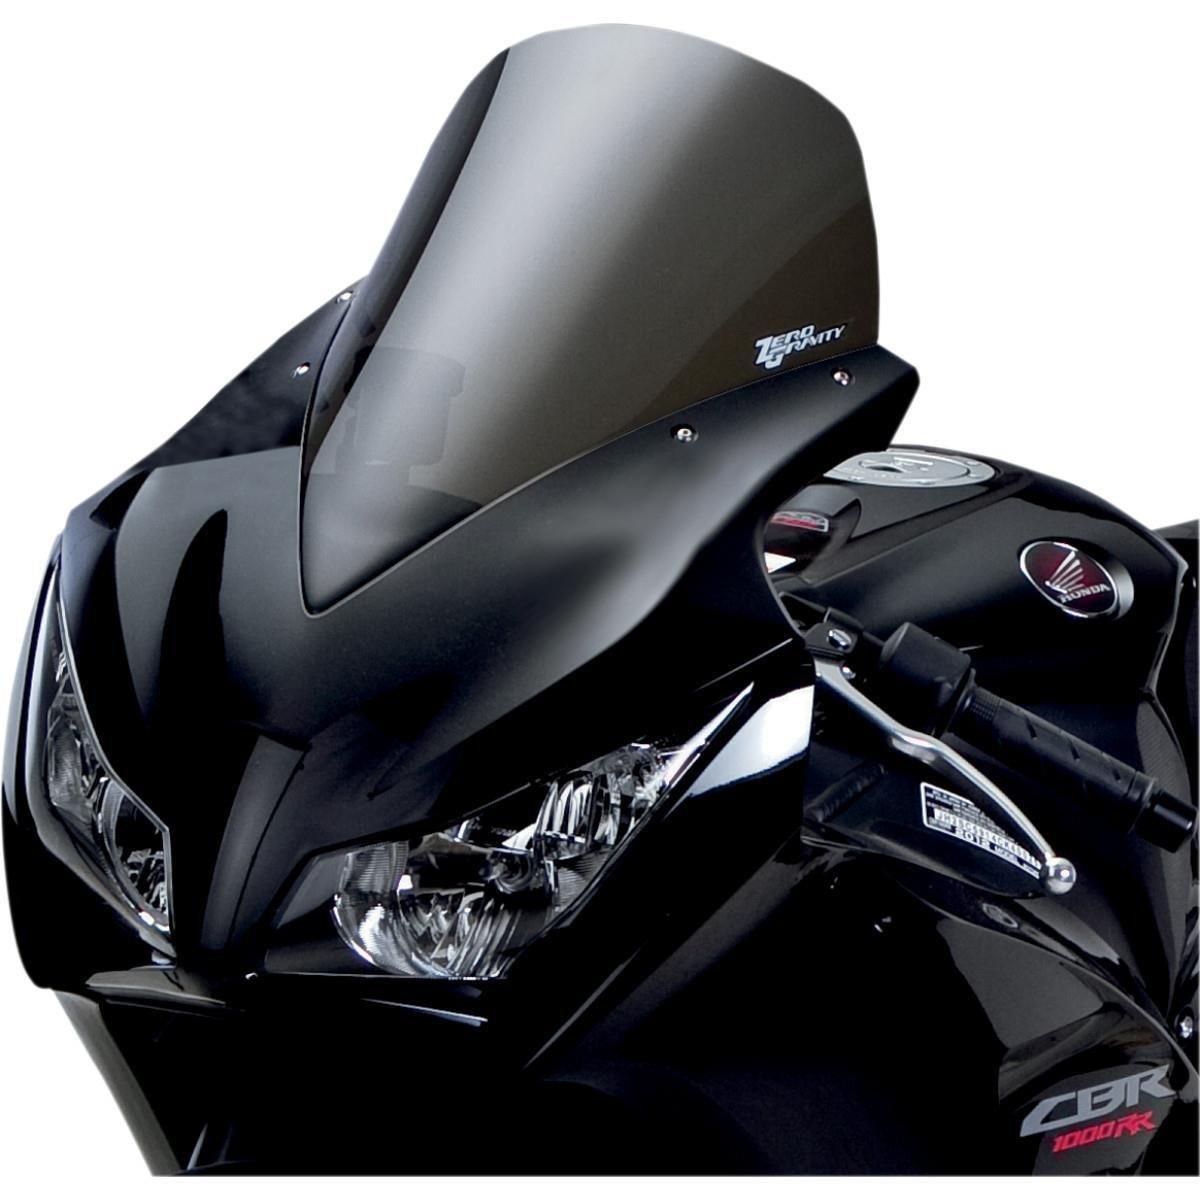 Zero Gravity Sport Touring Light Smoke Windscreen Yamaha FZ6R 2009-2013